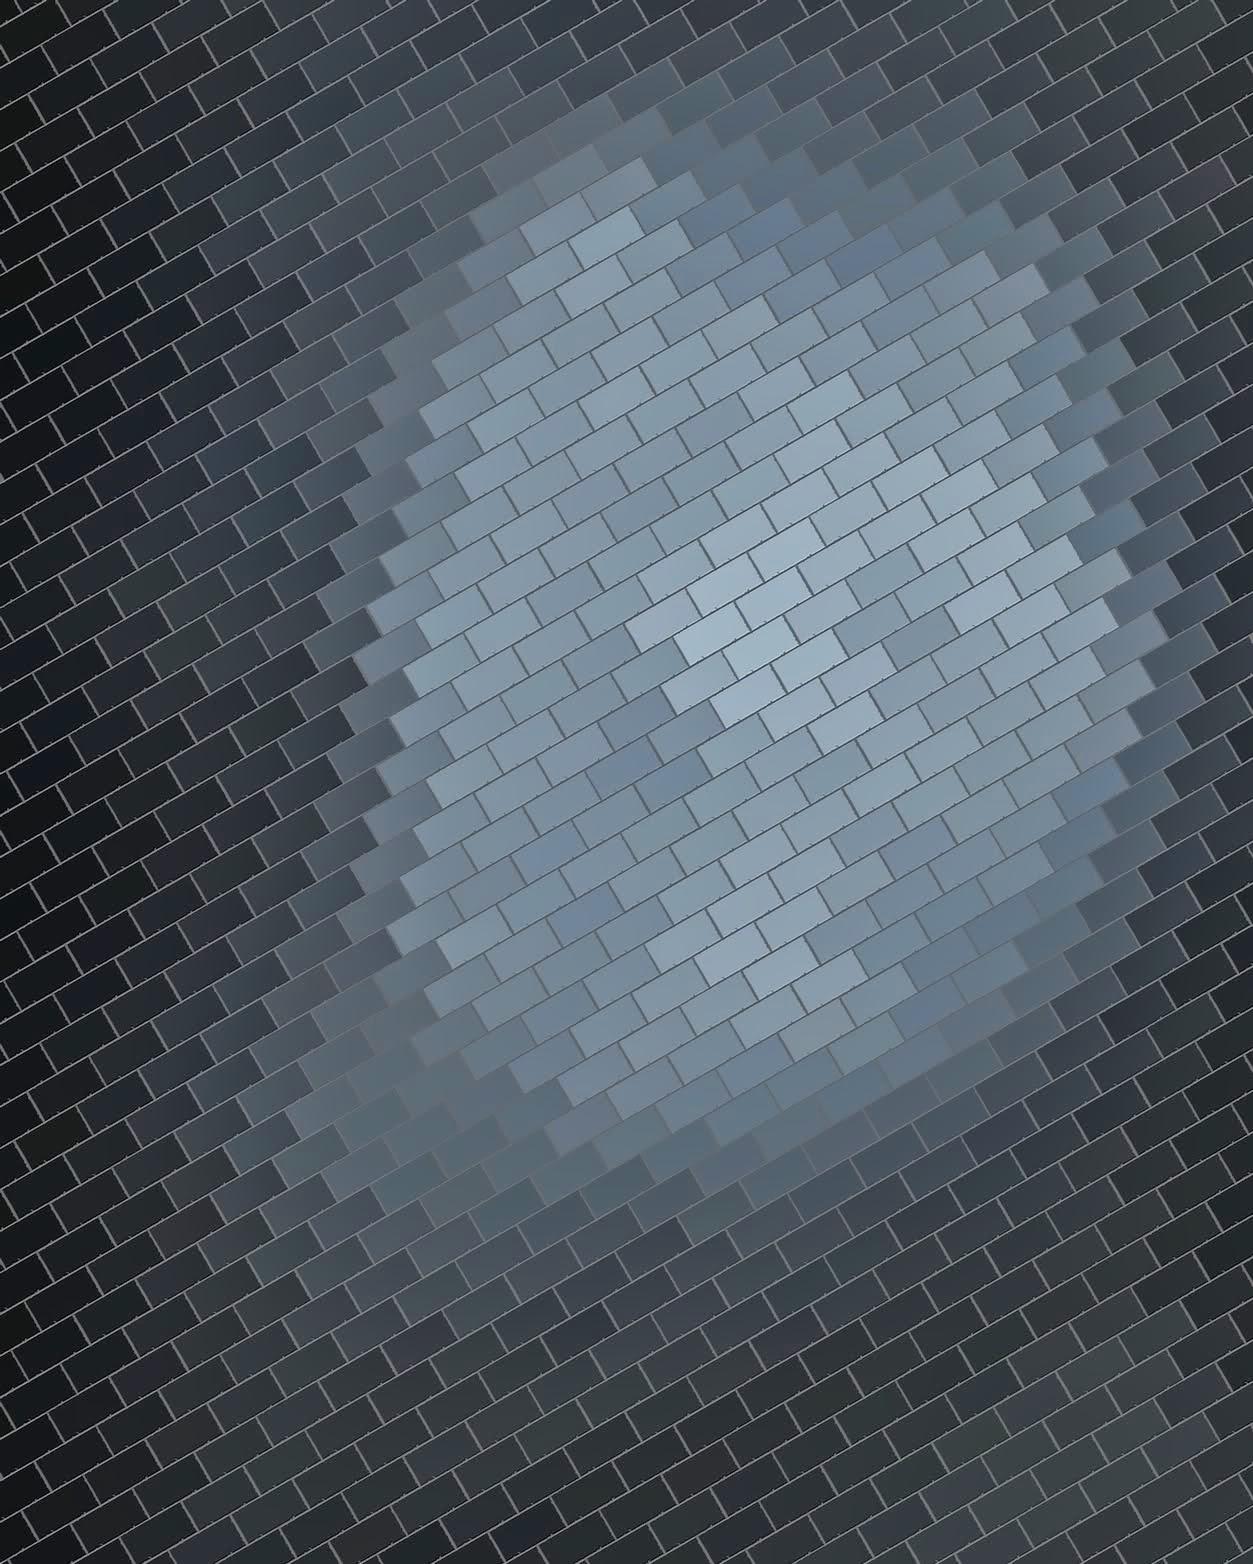 Studio Background Hd Jpg Free Download